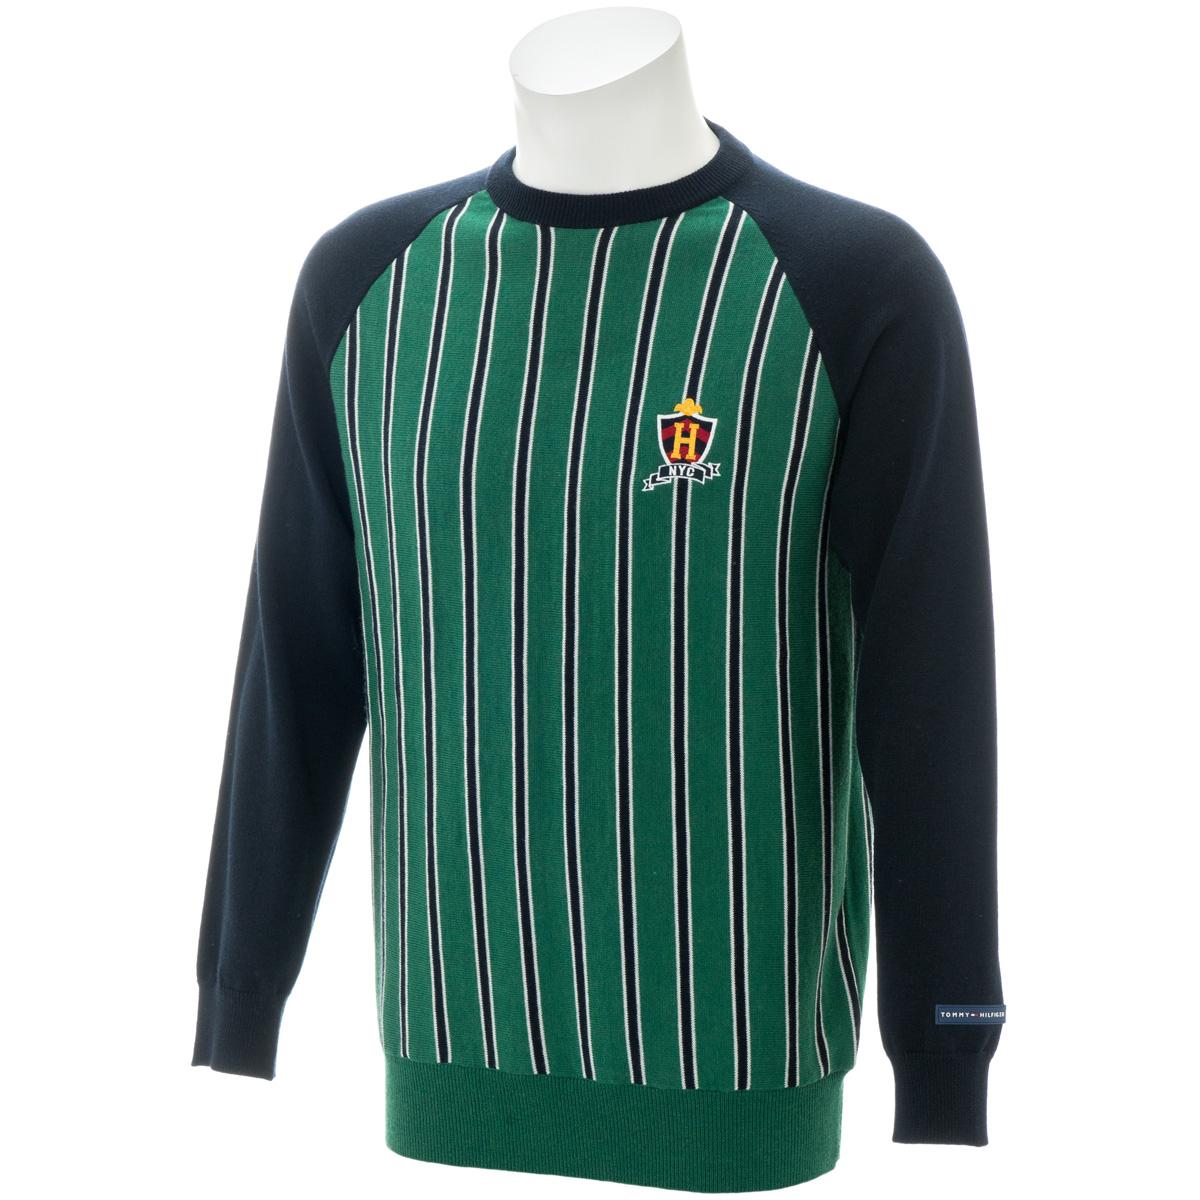 RAGLAN ストライプ セーター